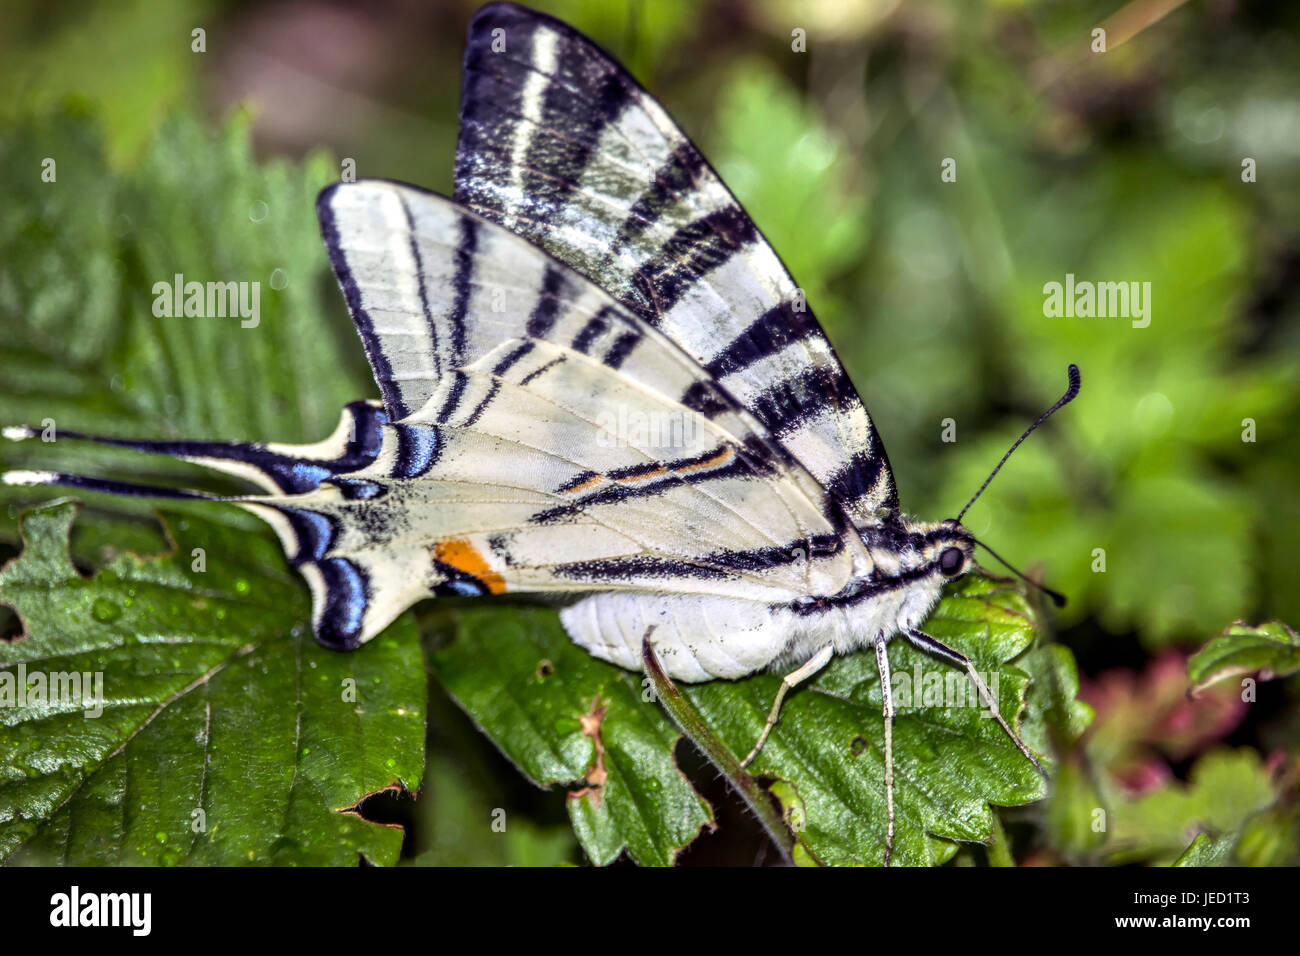 Scarce Swallowtail (Iphiclides podalirius) on a wild strawberry leaf - Stock Image